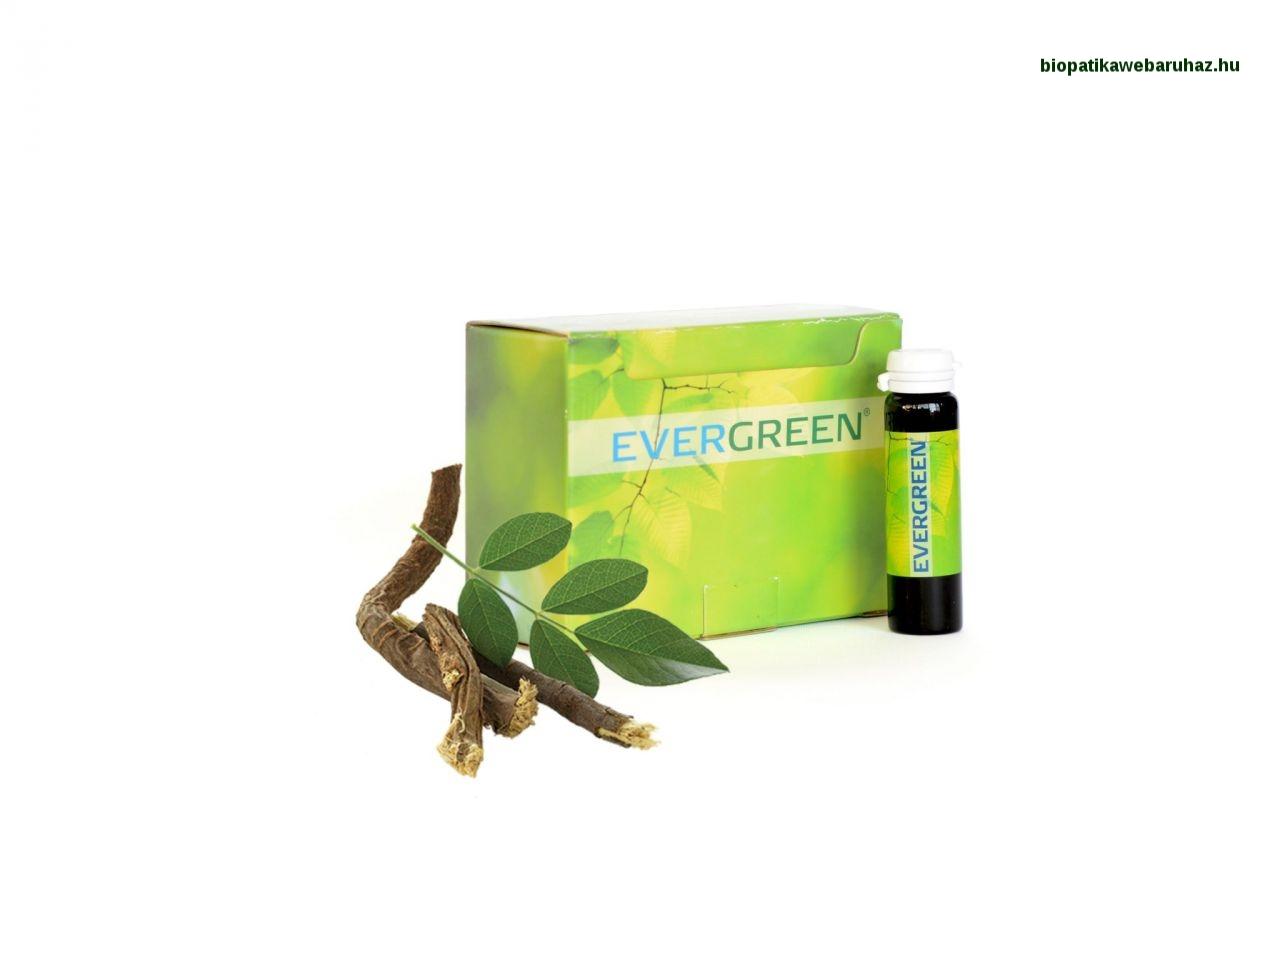 Sunrider Evergreen – Klorofillbomba